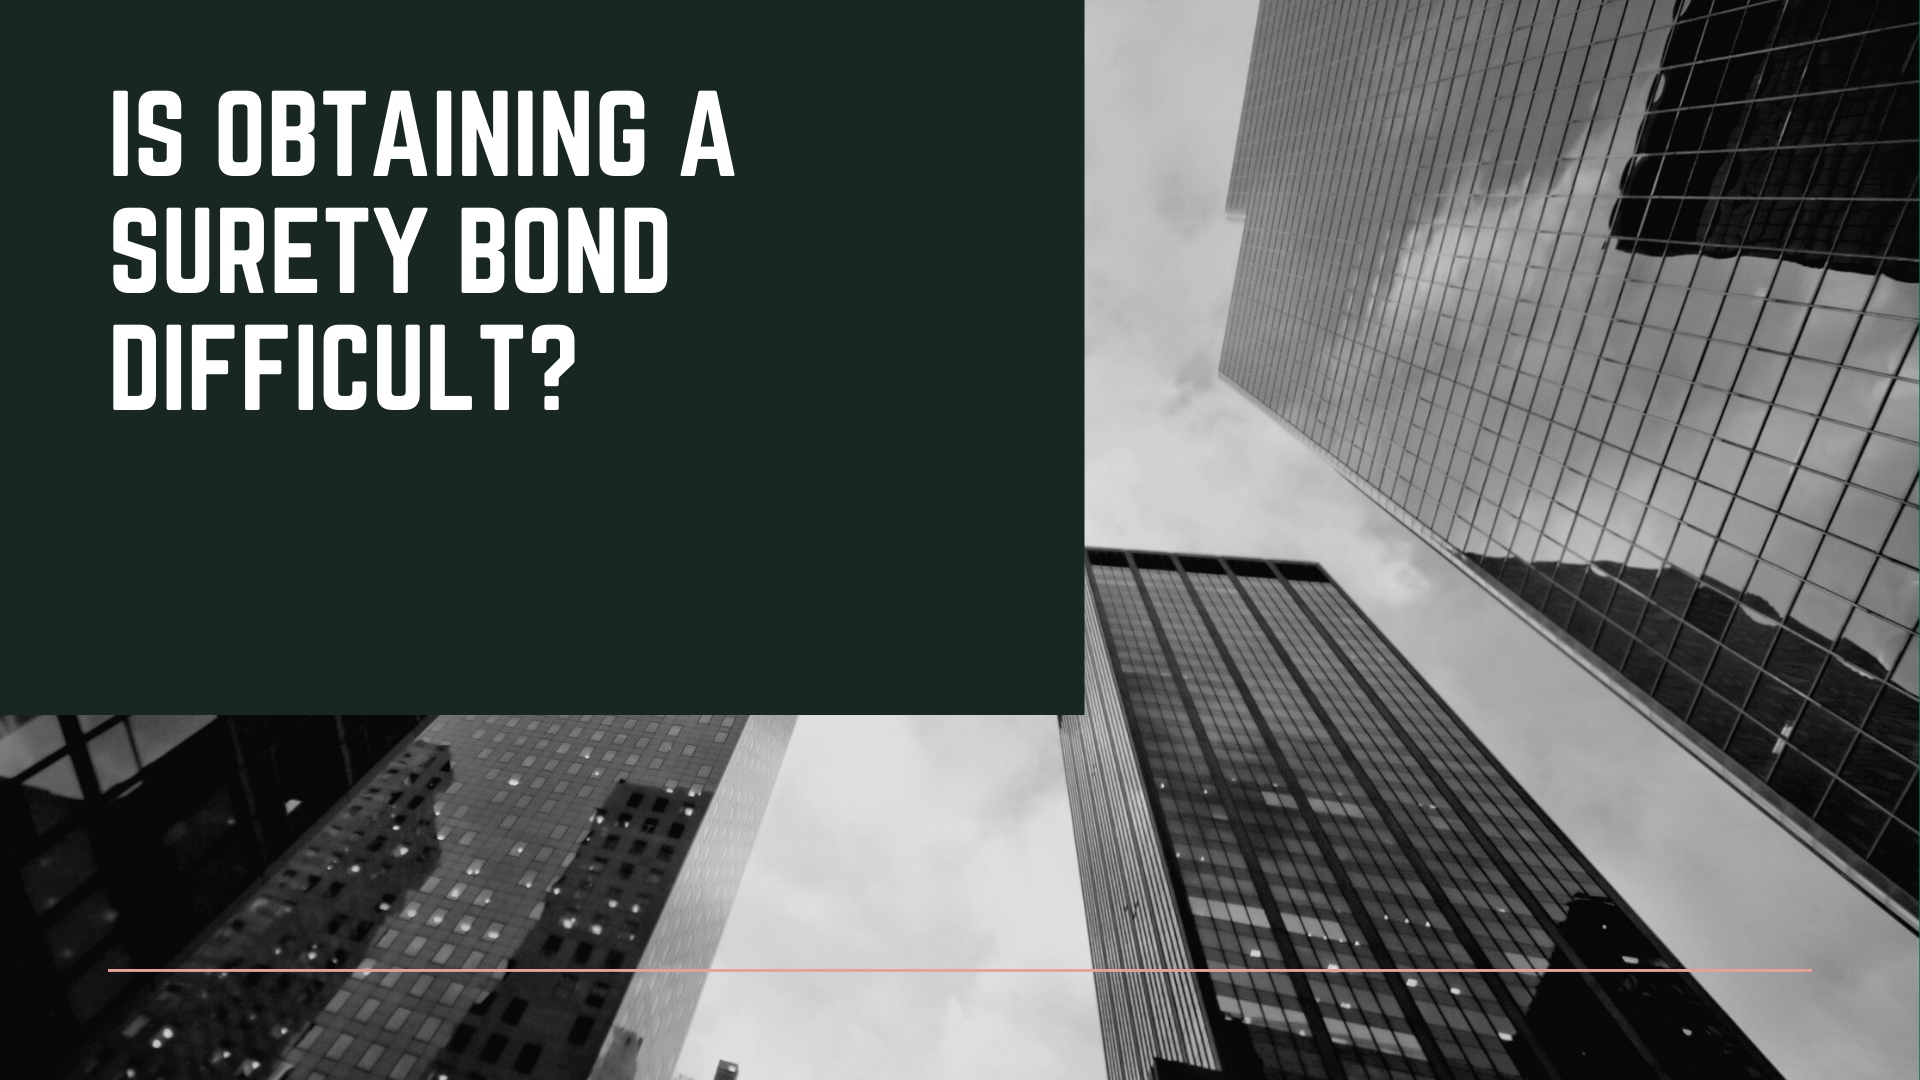 surety bond - is obtaining a surety bond difficult - building exterior